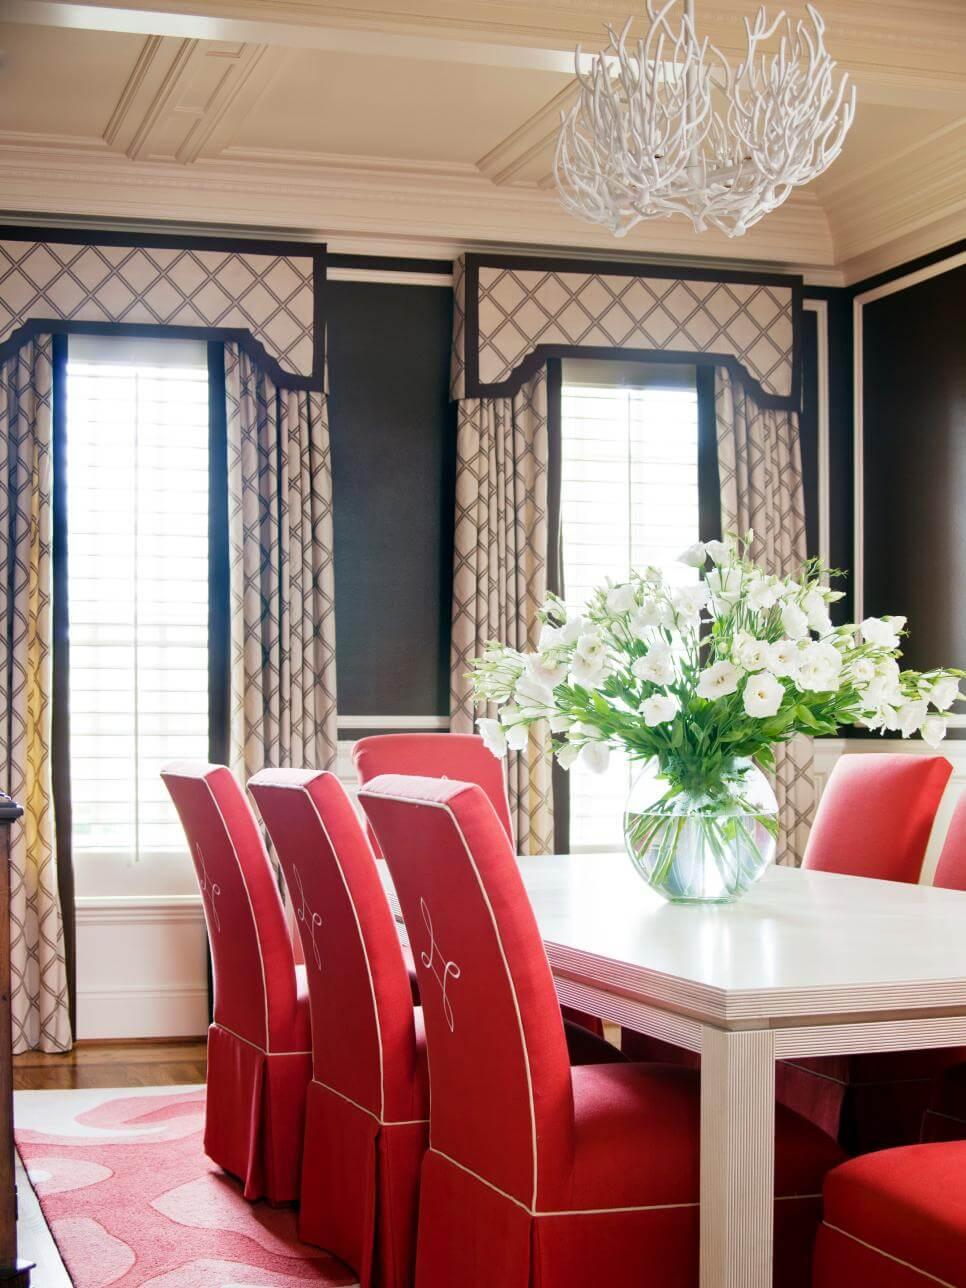 Original_Preppy-Style-Tobi-Fairley-Dining-Room_s3x4.jpg.rend_.hgtvcom.966.1288.jpeg